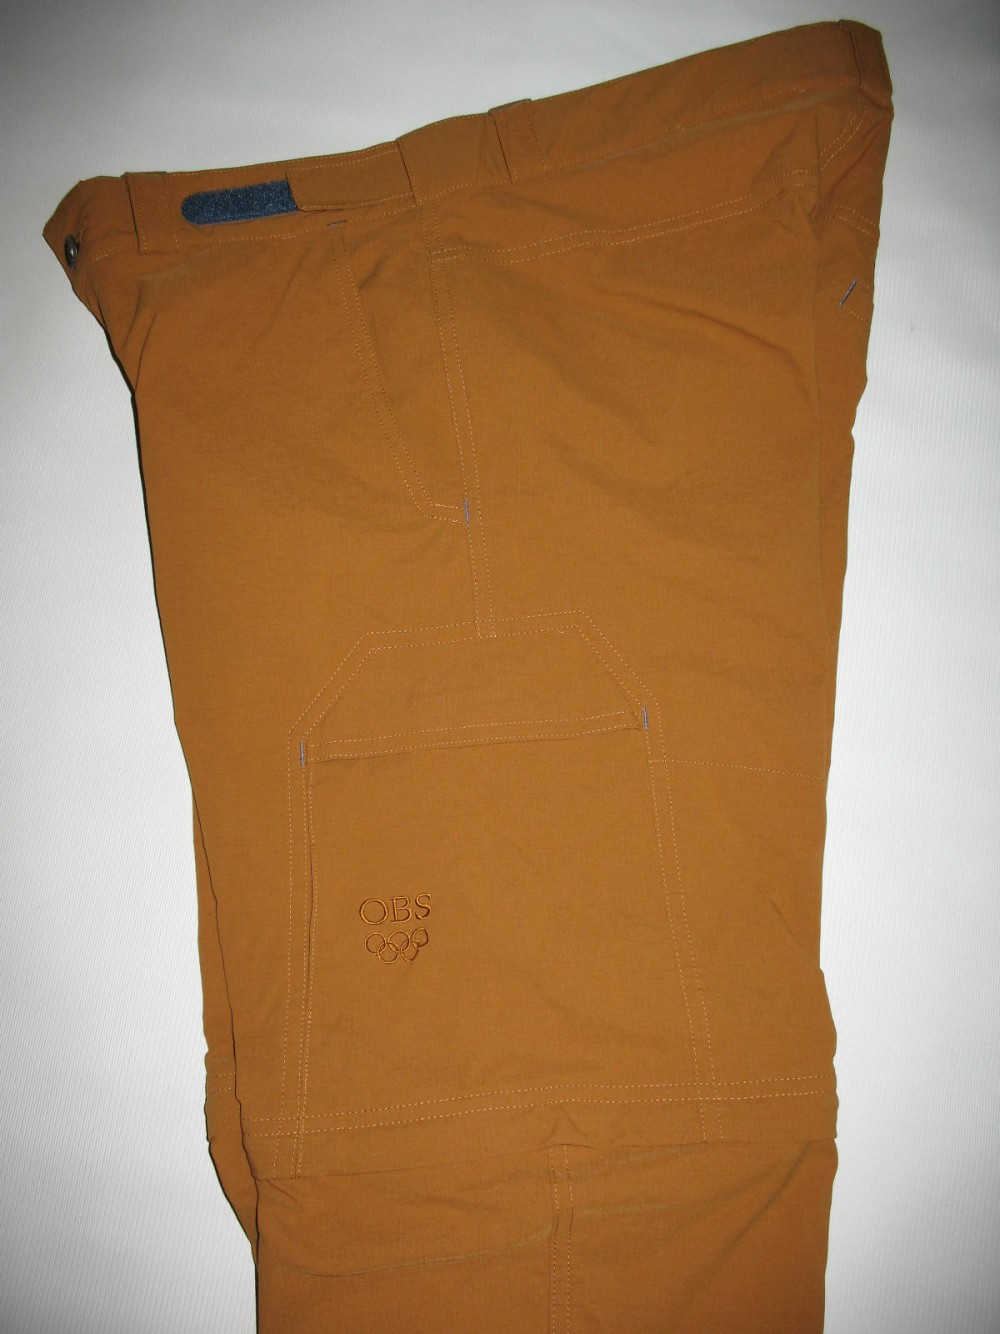 Штаны HELLY HANSEN obs olimpic 2in1 pants (размер M) - 7